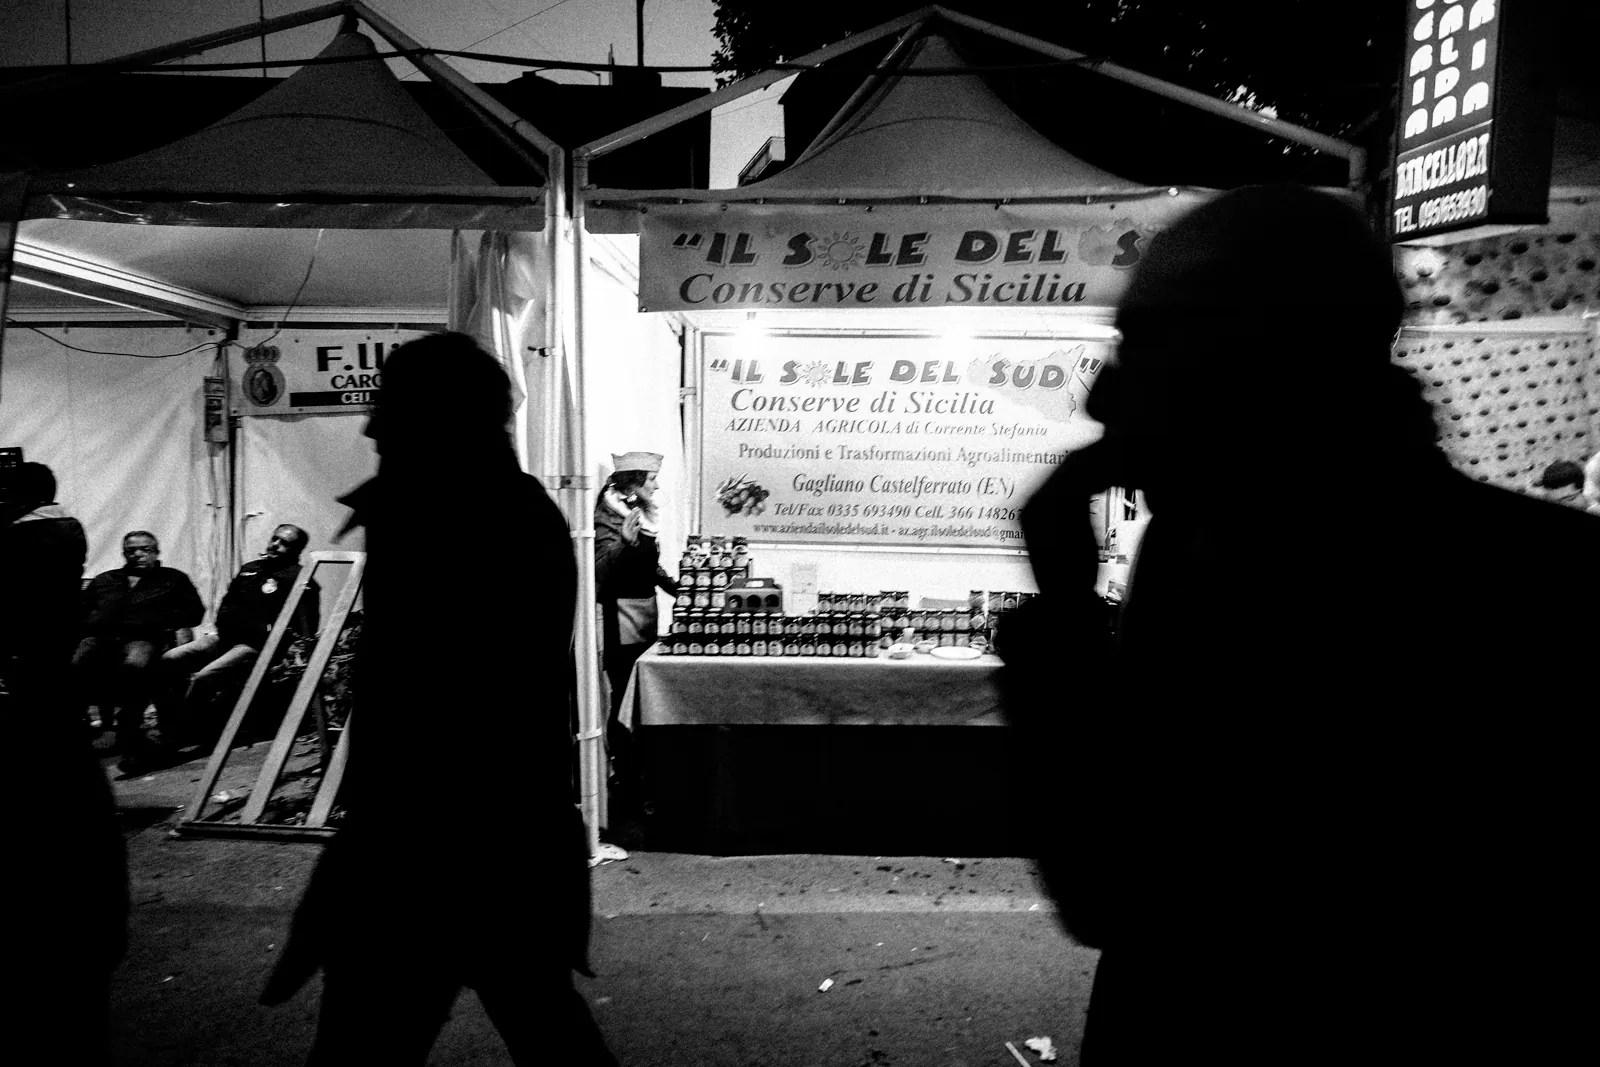 DSCF0493 - COME TRATTARE IL RUMORE DIGITALE IN STREET PHOTOGRAPHY - fotostreet.it